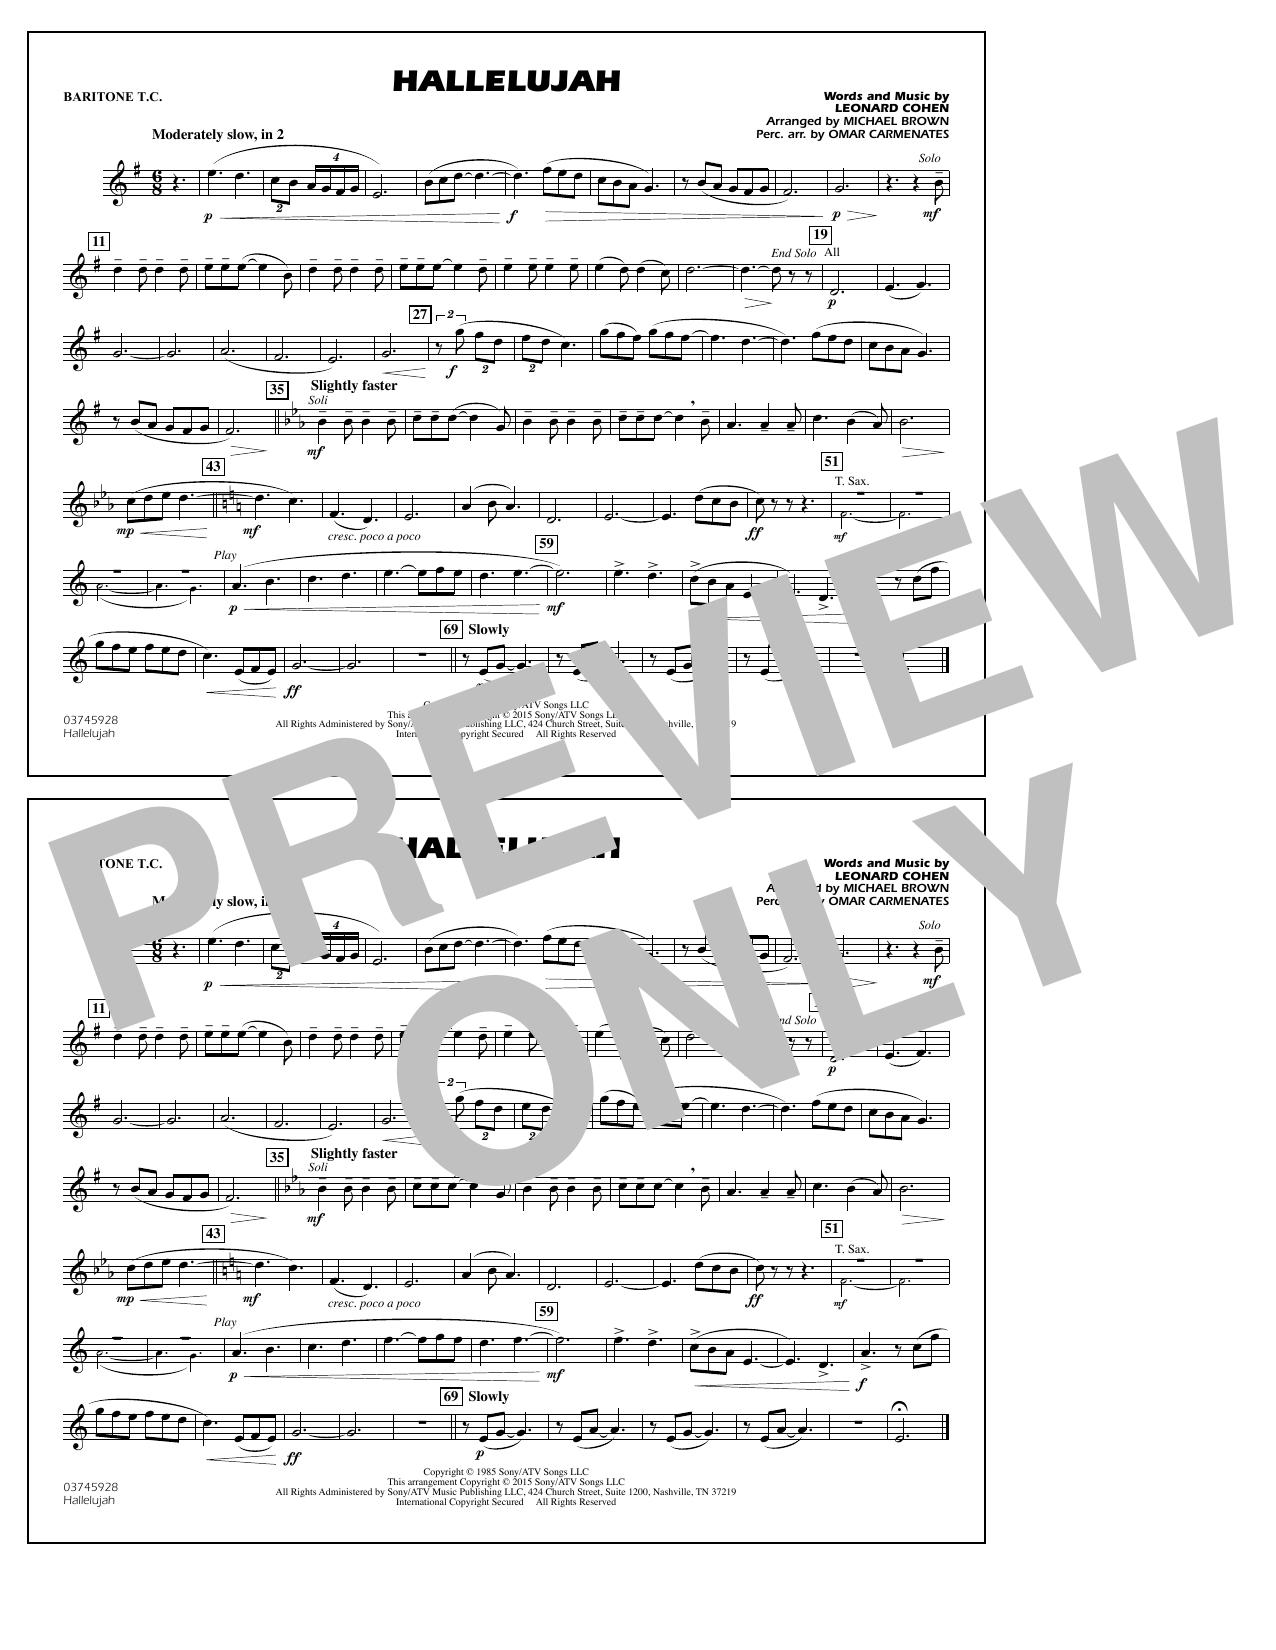 Hallelujah - Baritone T.C. (Marching Band)